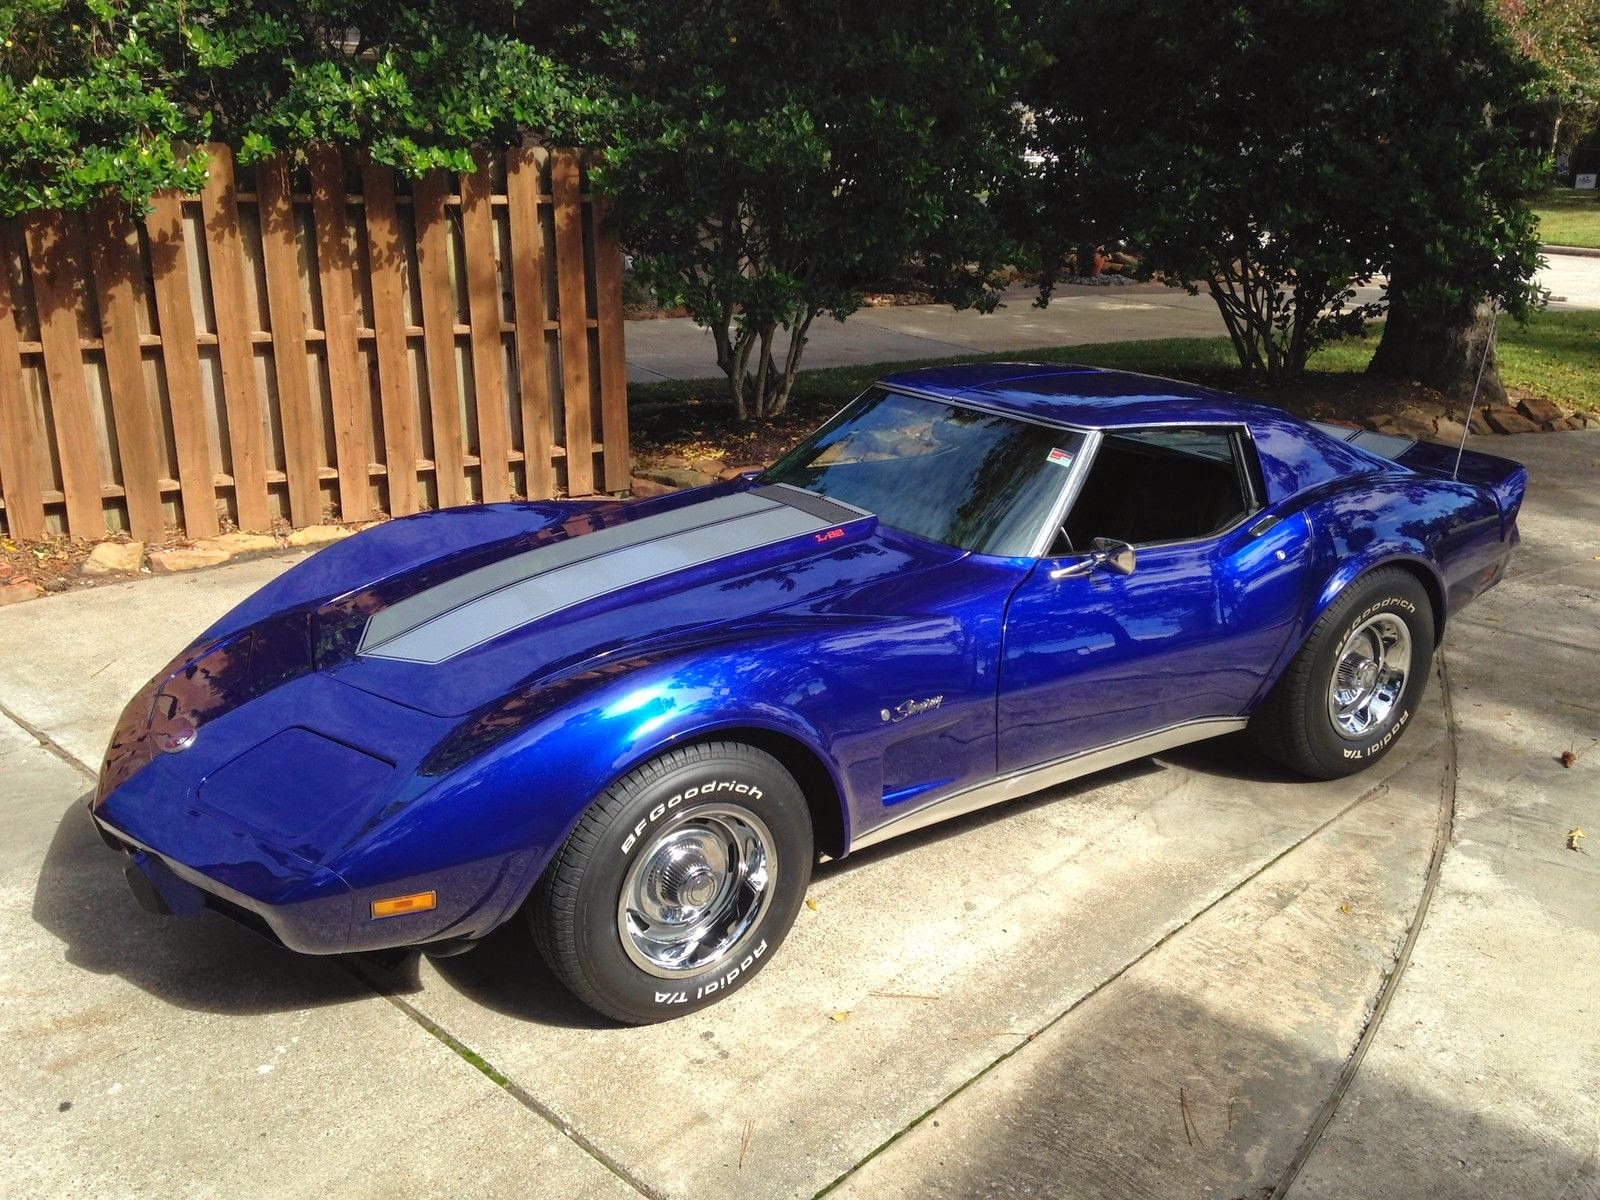 1975 Chevrolet Corvette Stingray 4 Speed Manual For Sale American